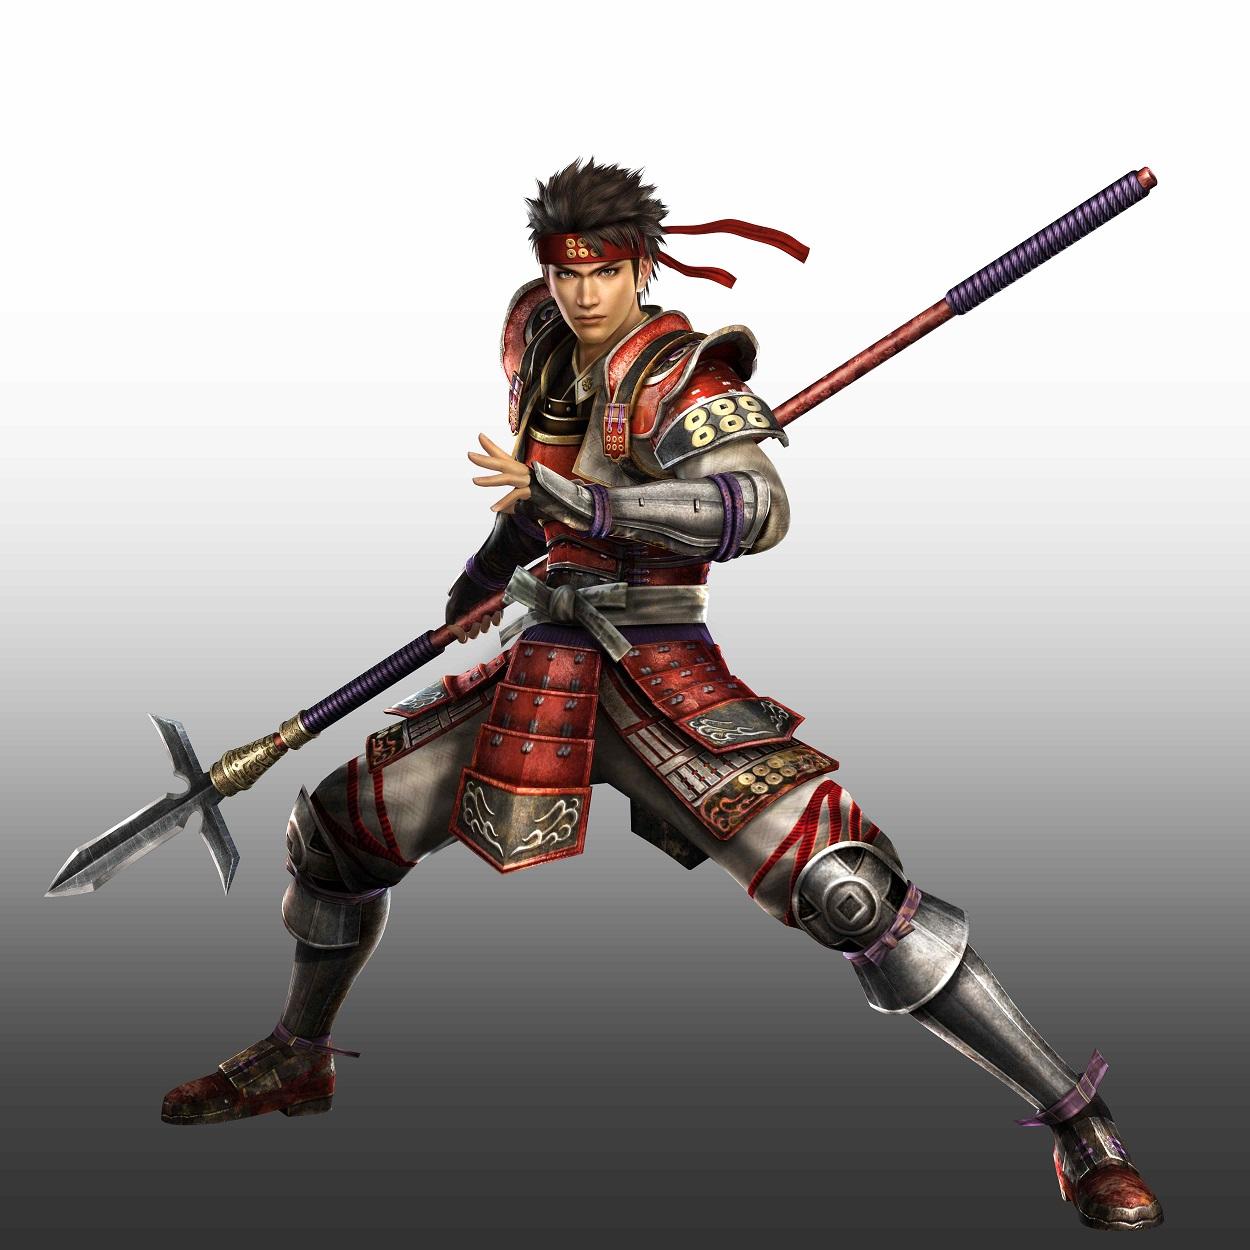 Detaily bojového systému v Samurai Warriors: Spirit of Sanada 142479